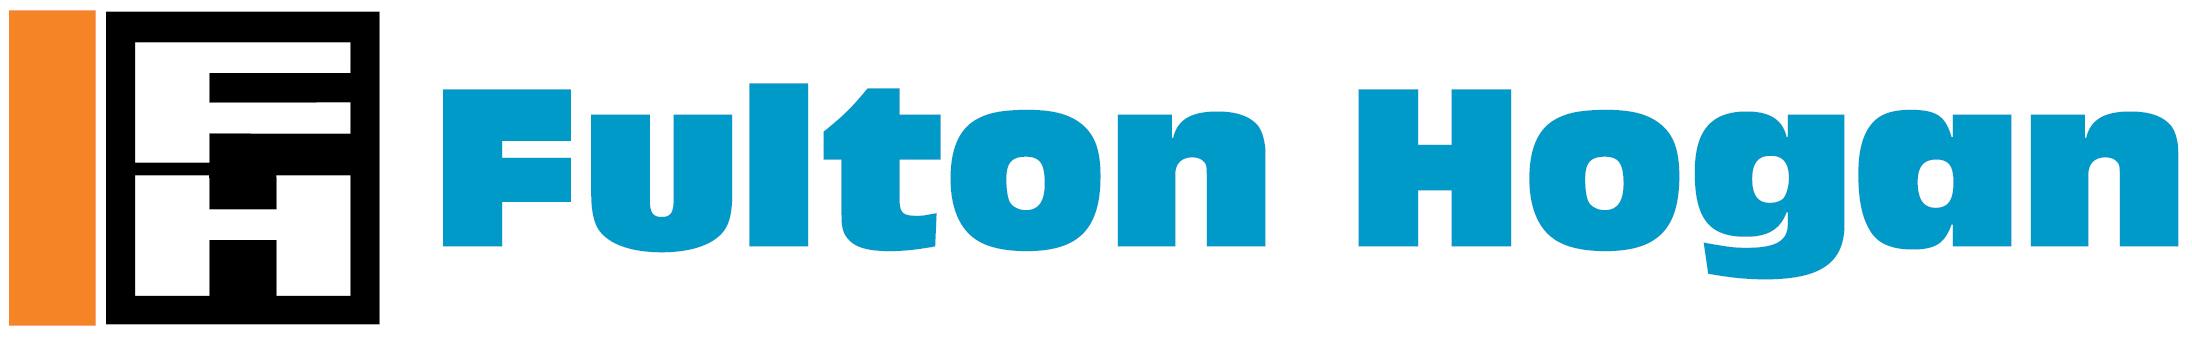 Fulton Hogan Logo.jpg